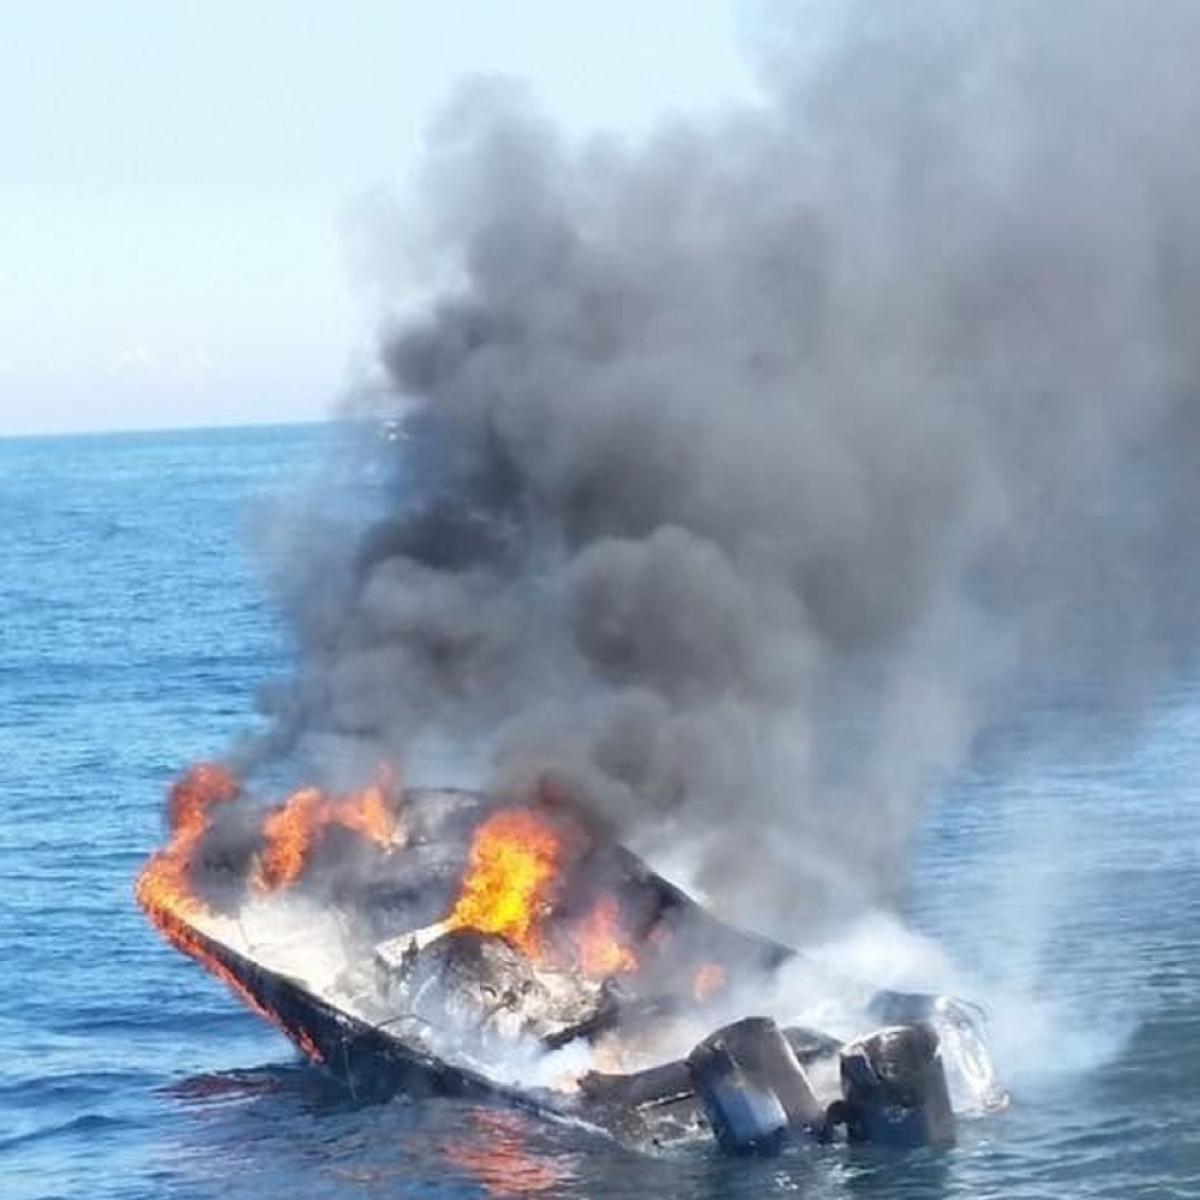 boat on fire near Martha's Vineyard